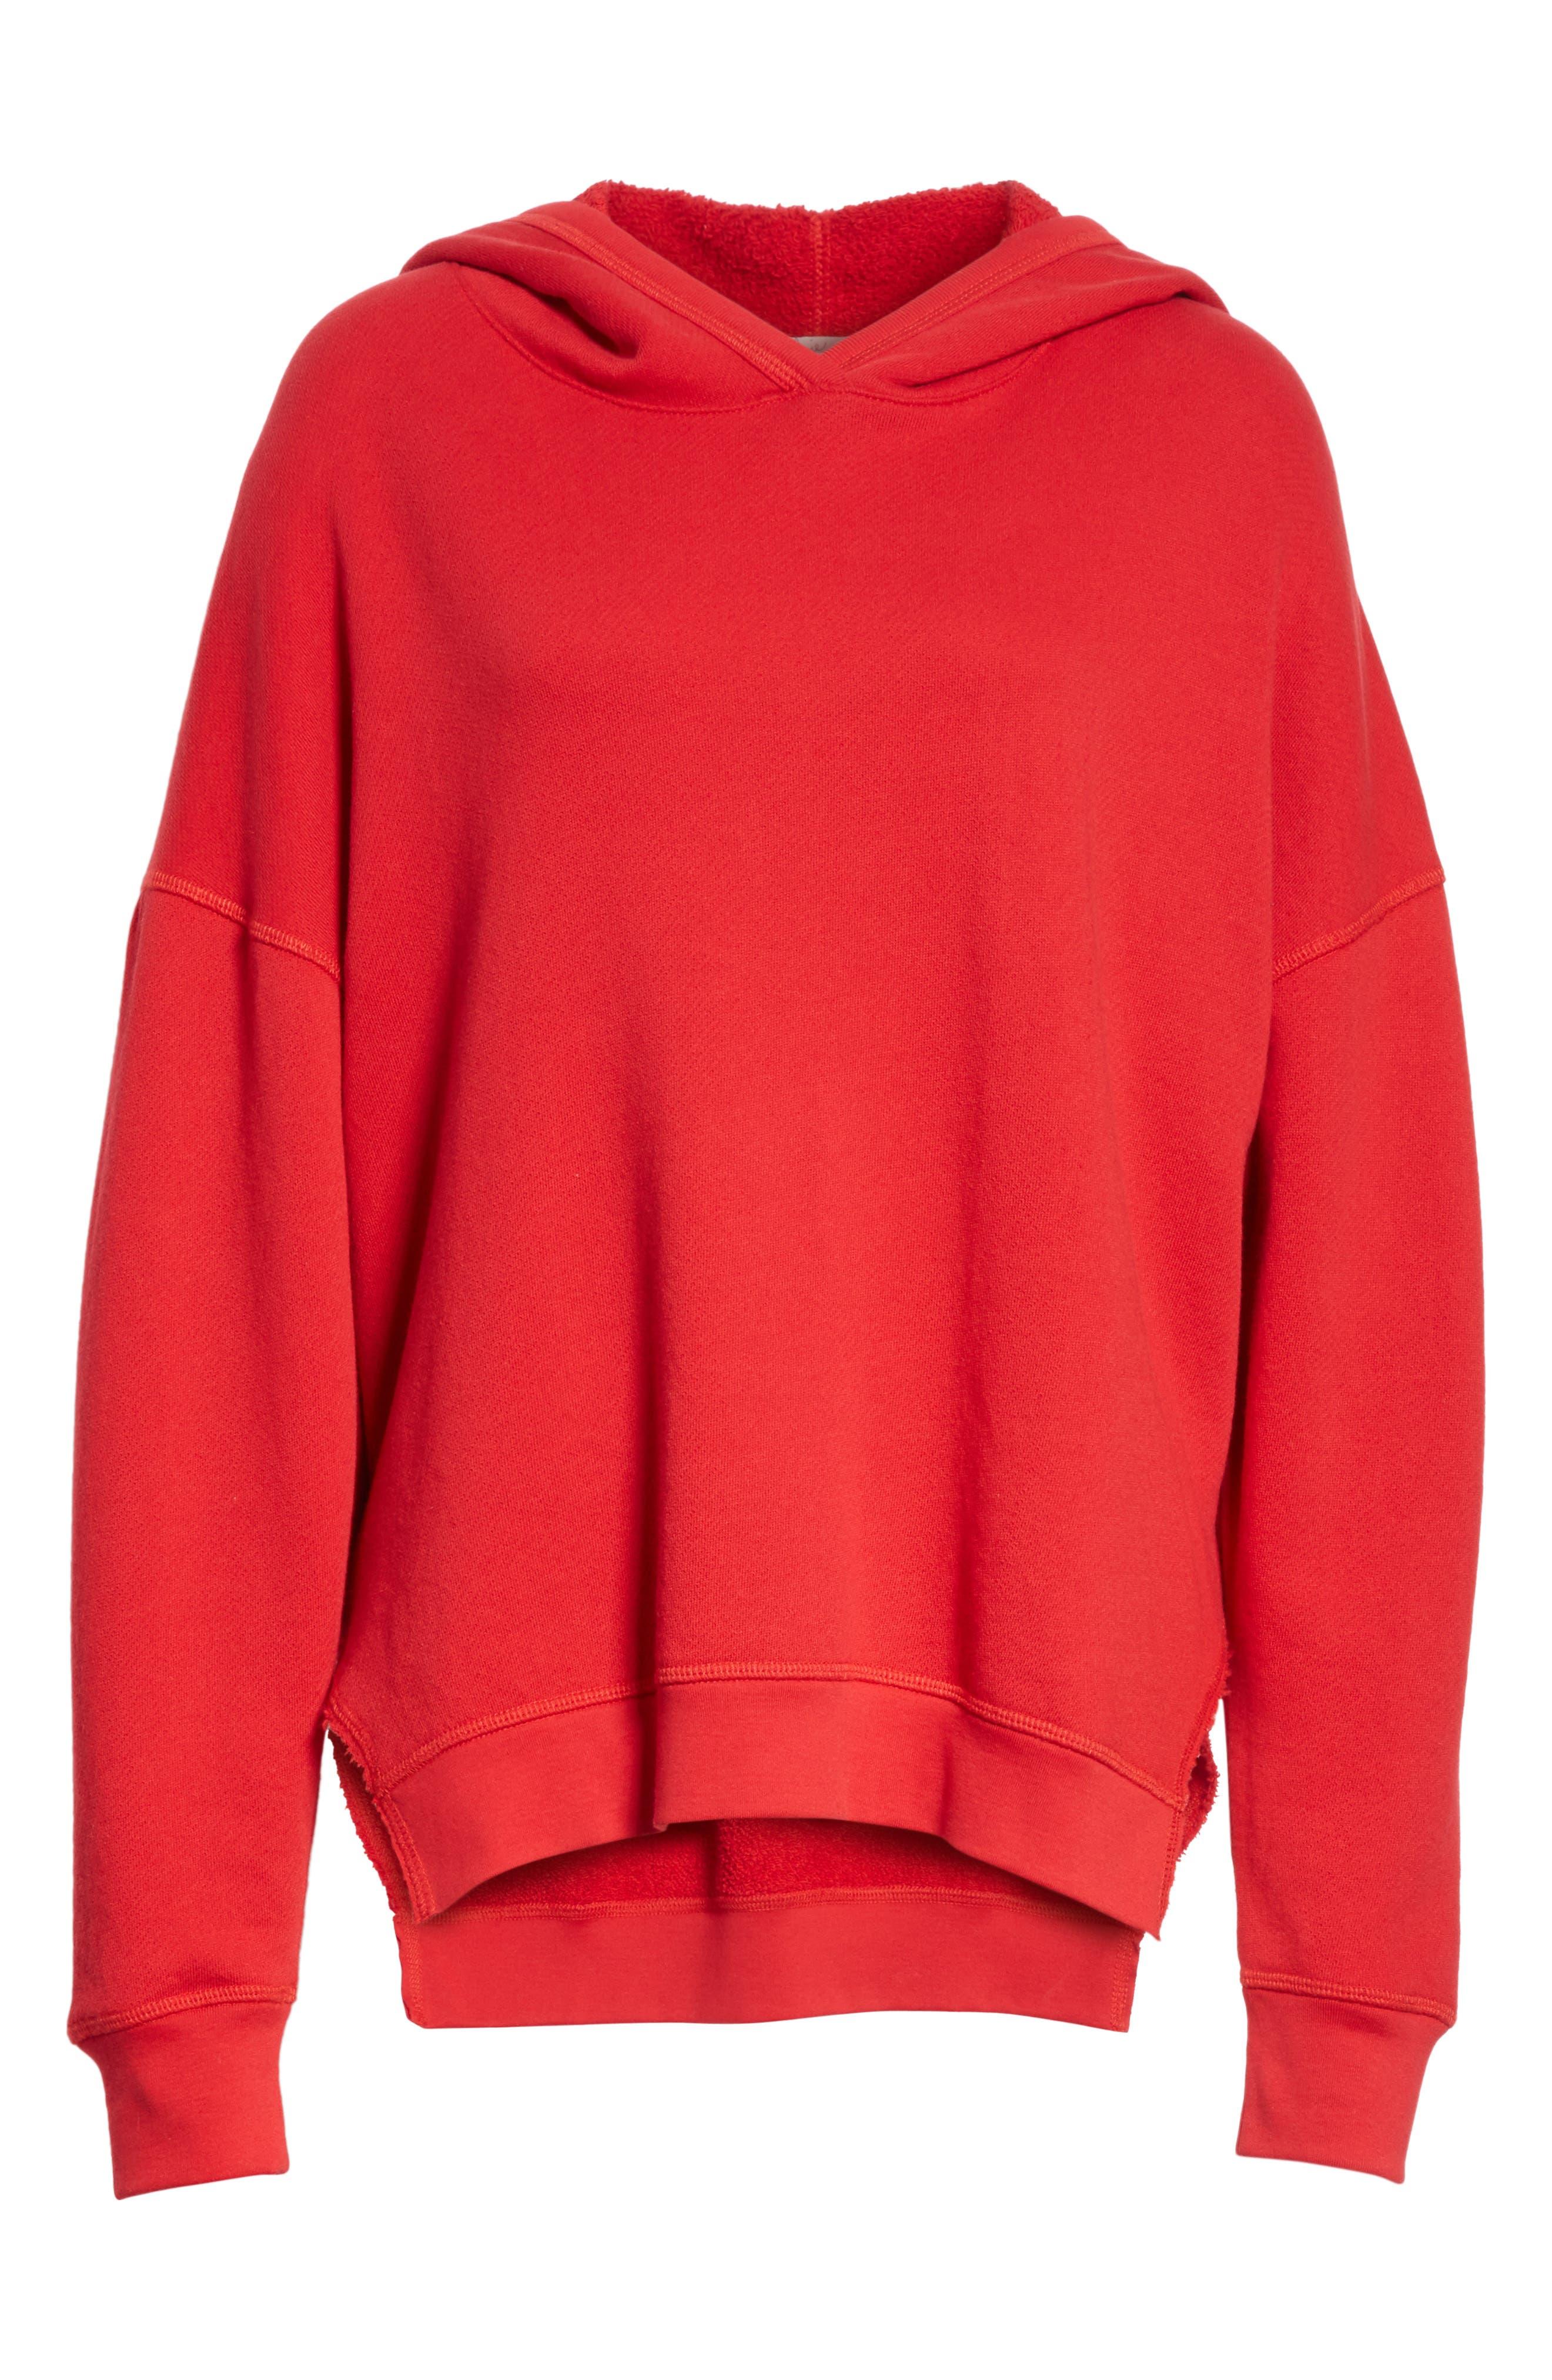 Adene Hooded Sweatshirt,                             Alternate thumbnail 6, color,                             600